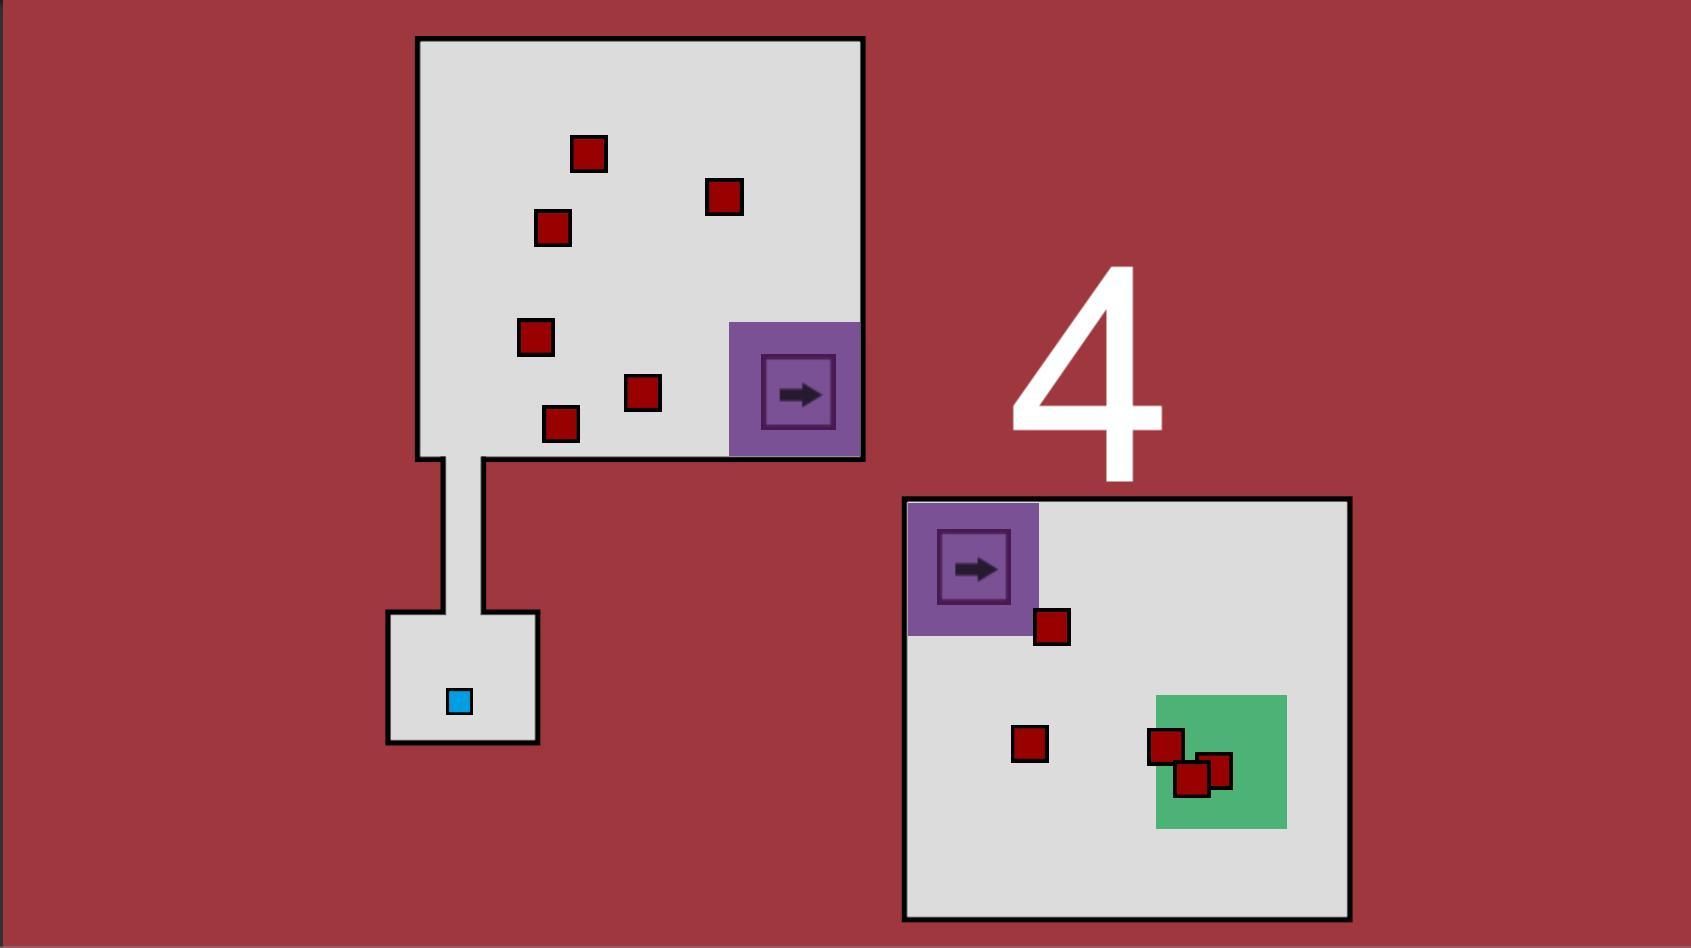 Dunyanin En Zor Oyunu For Android Apk Download